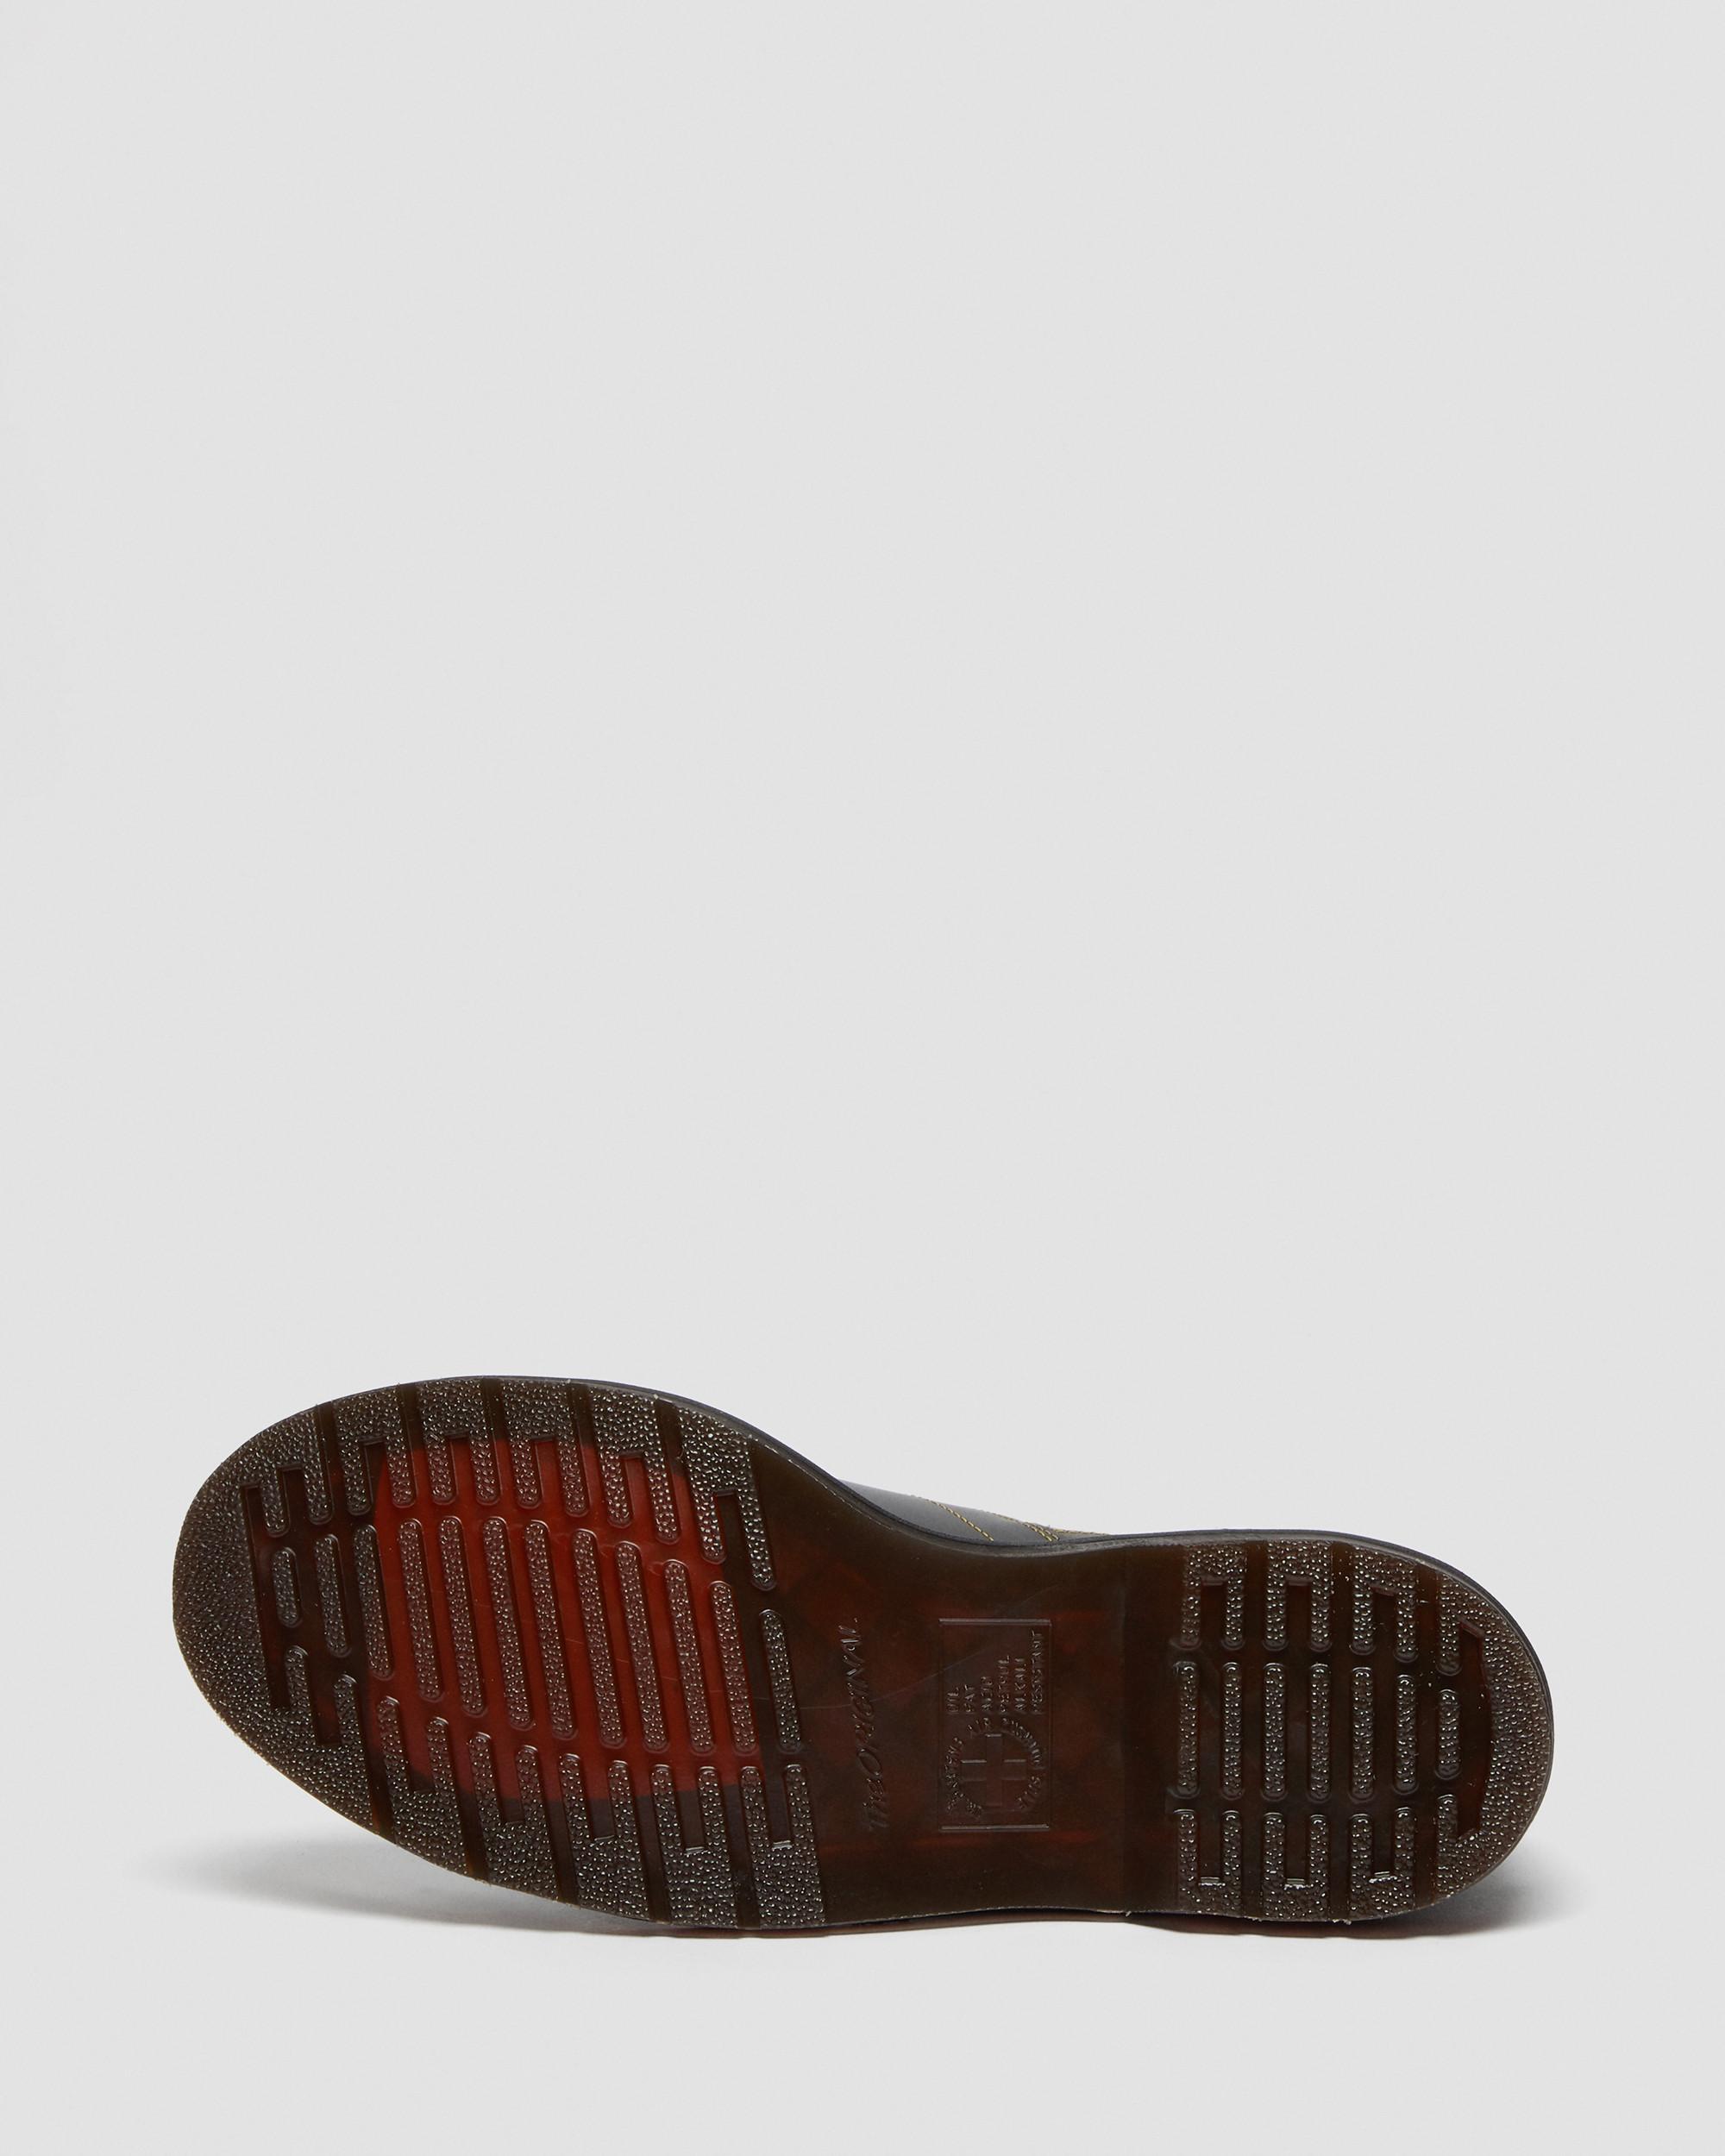 Dr. Martens Church Smooth 6 Eye Boots Black Vintage